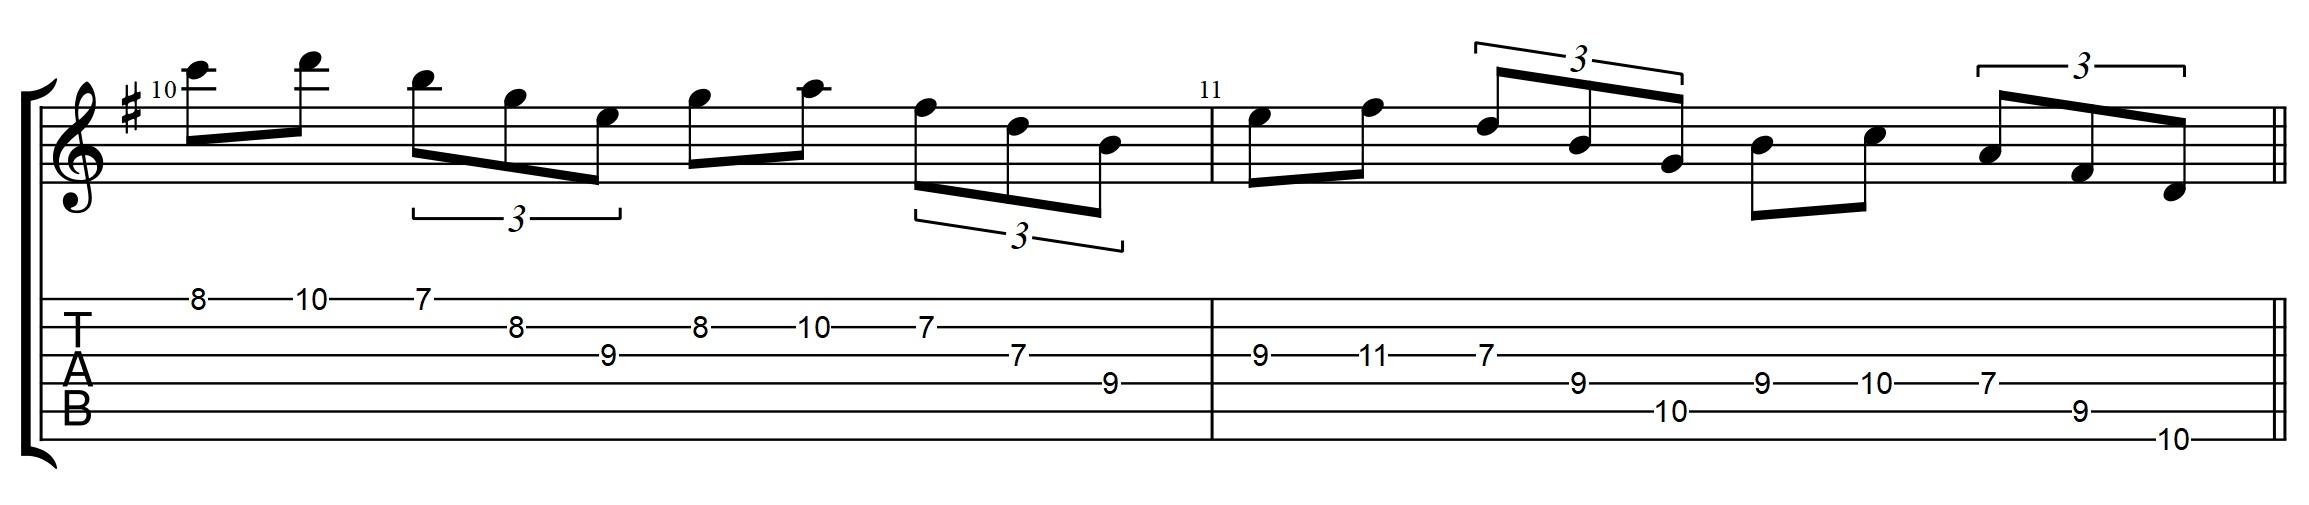 bebop jazz guitar Archives - Jens Larsen